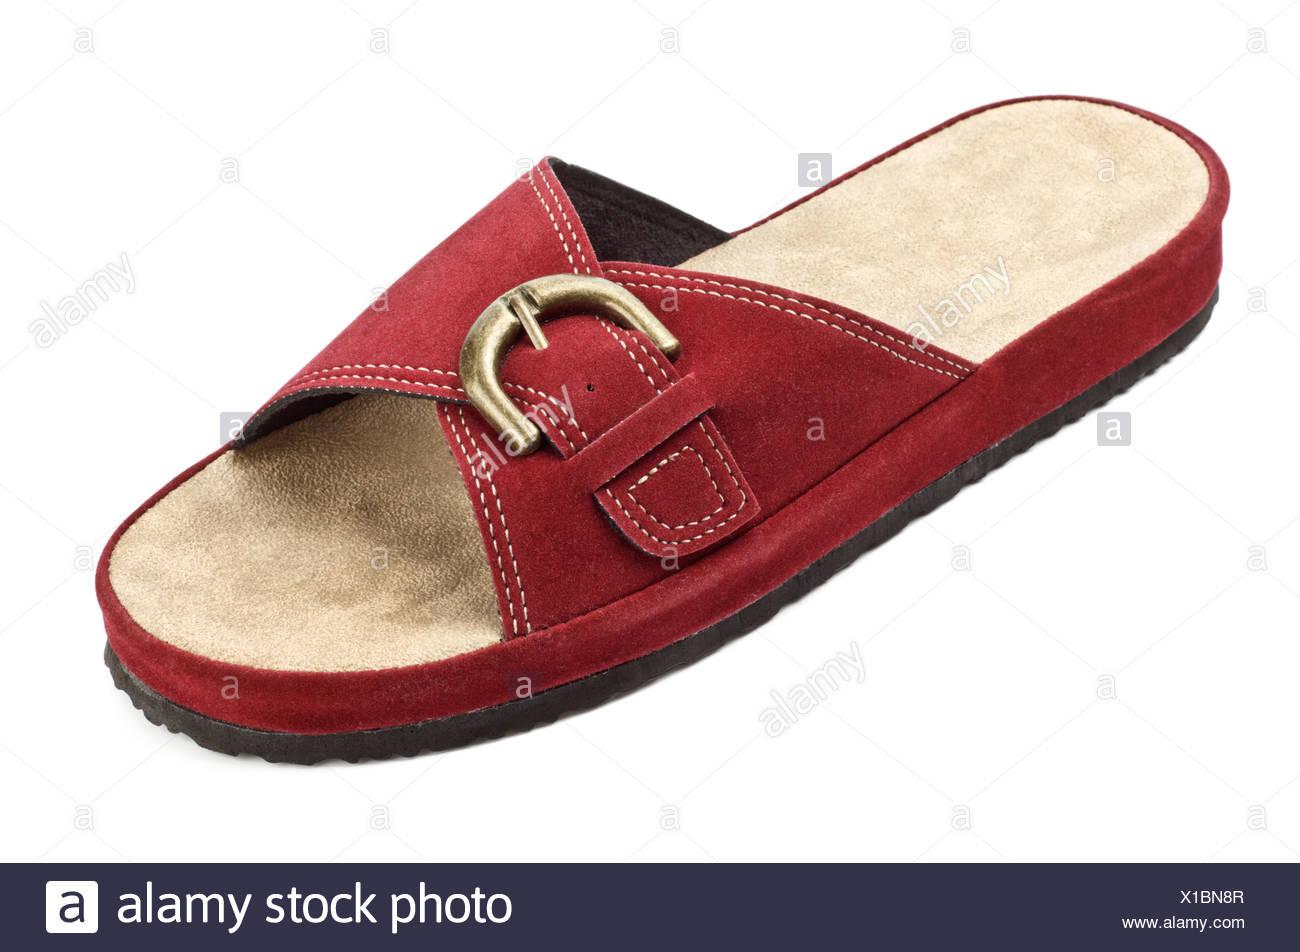 8c547be1b50 red slipper Stock Photo  276238727 - Alamy